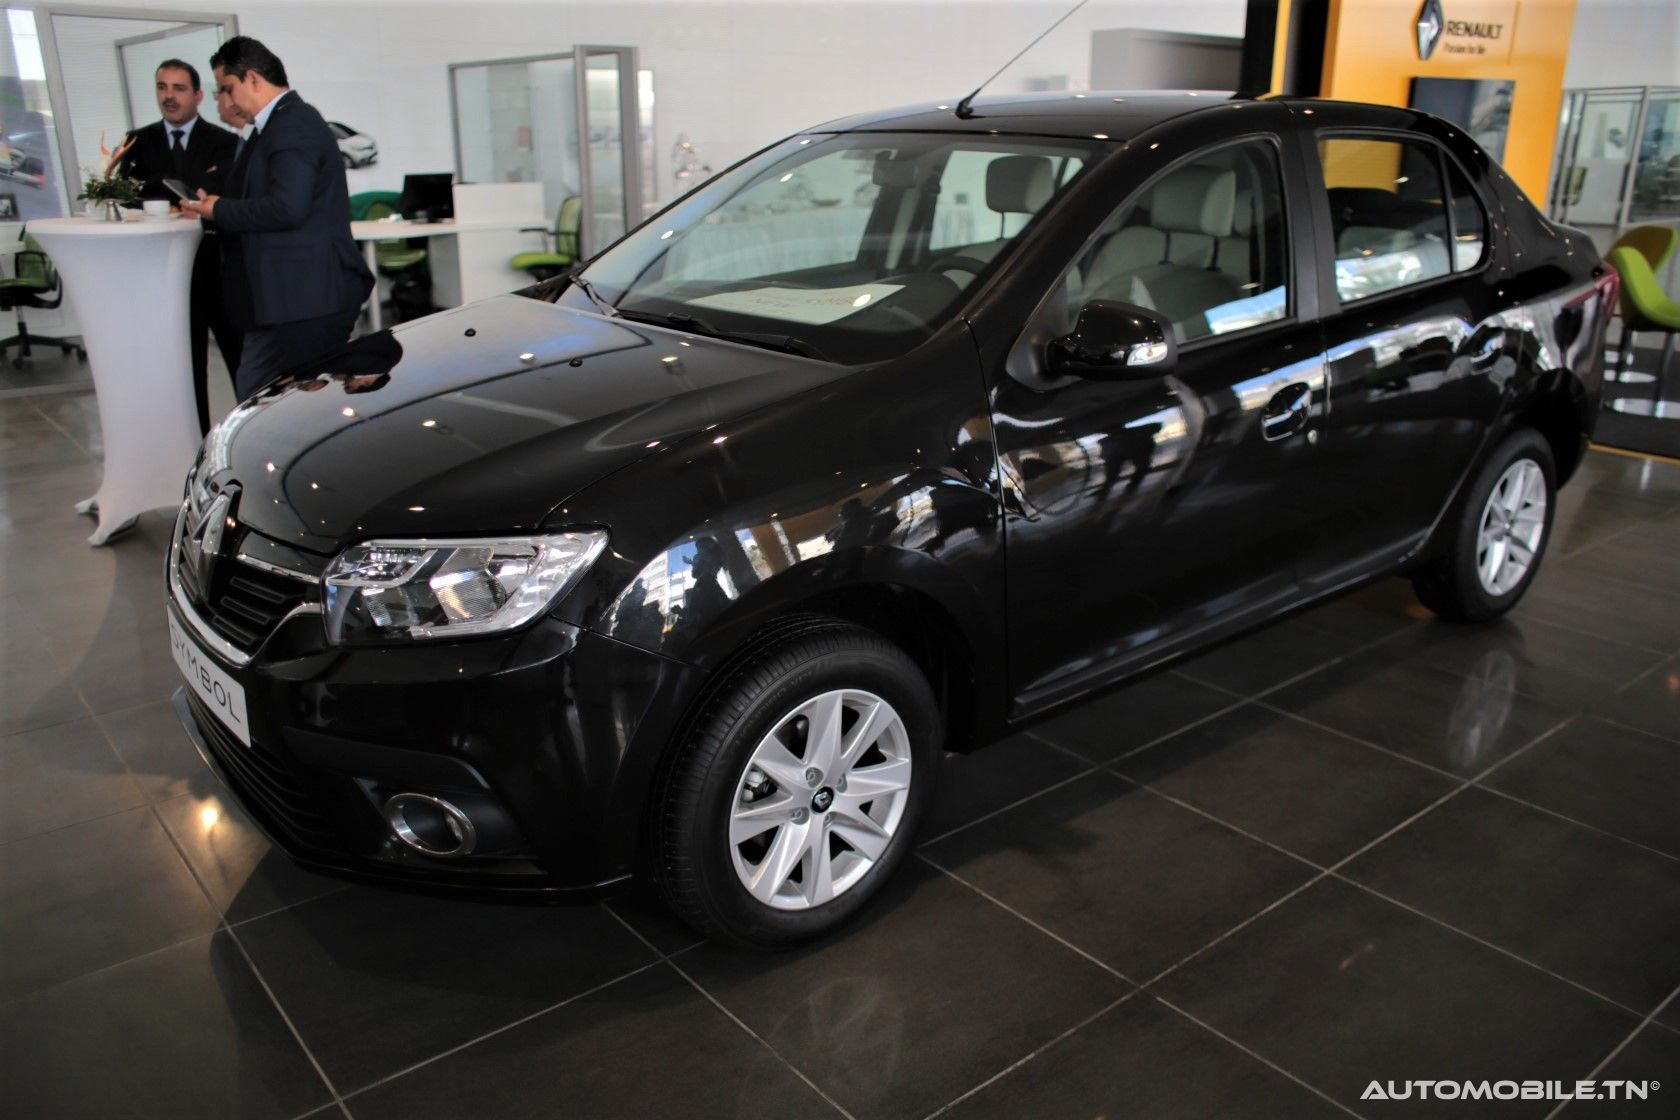 Prix Renault Symbol A Partir De 38 500 Dt